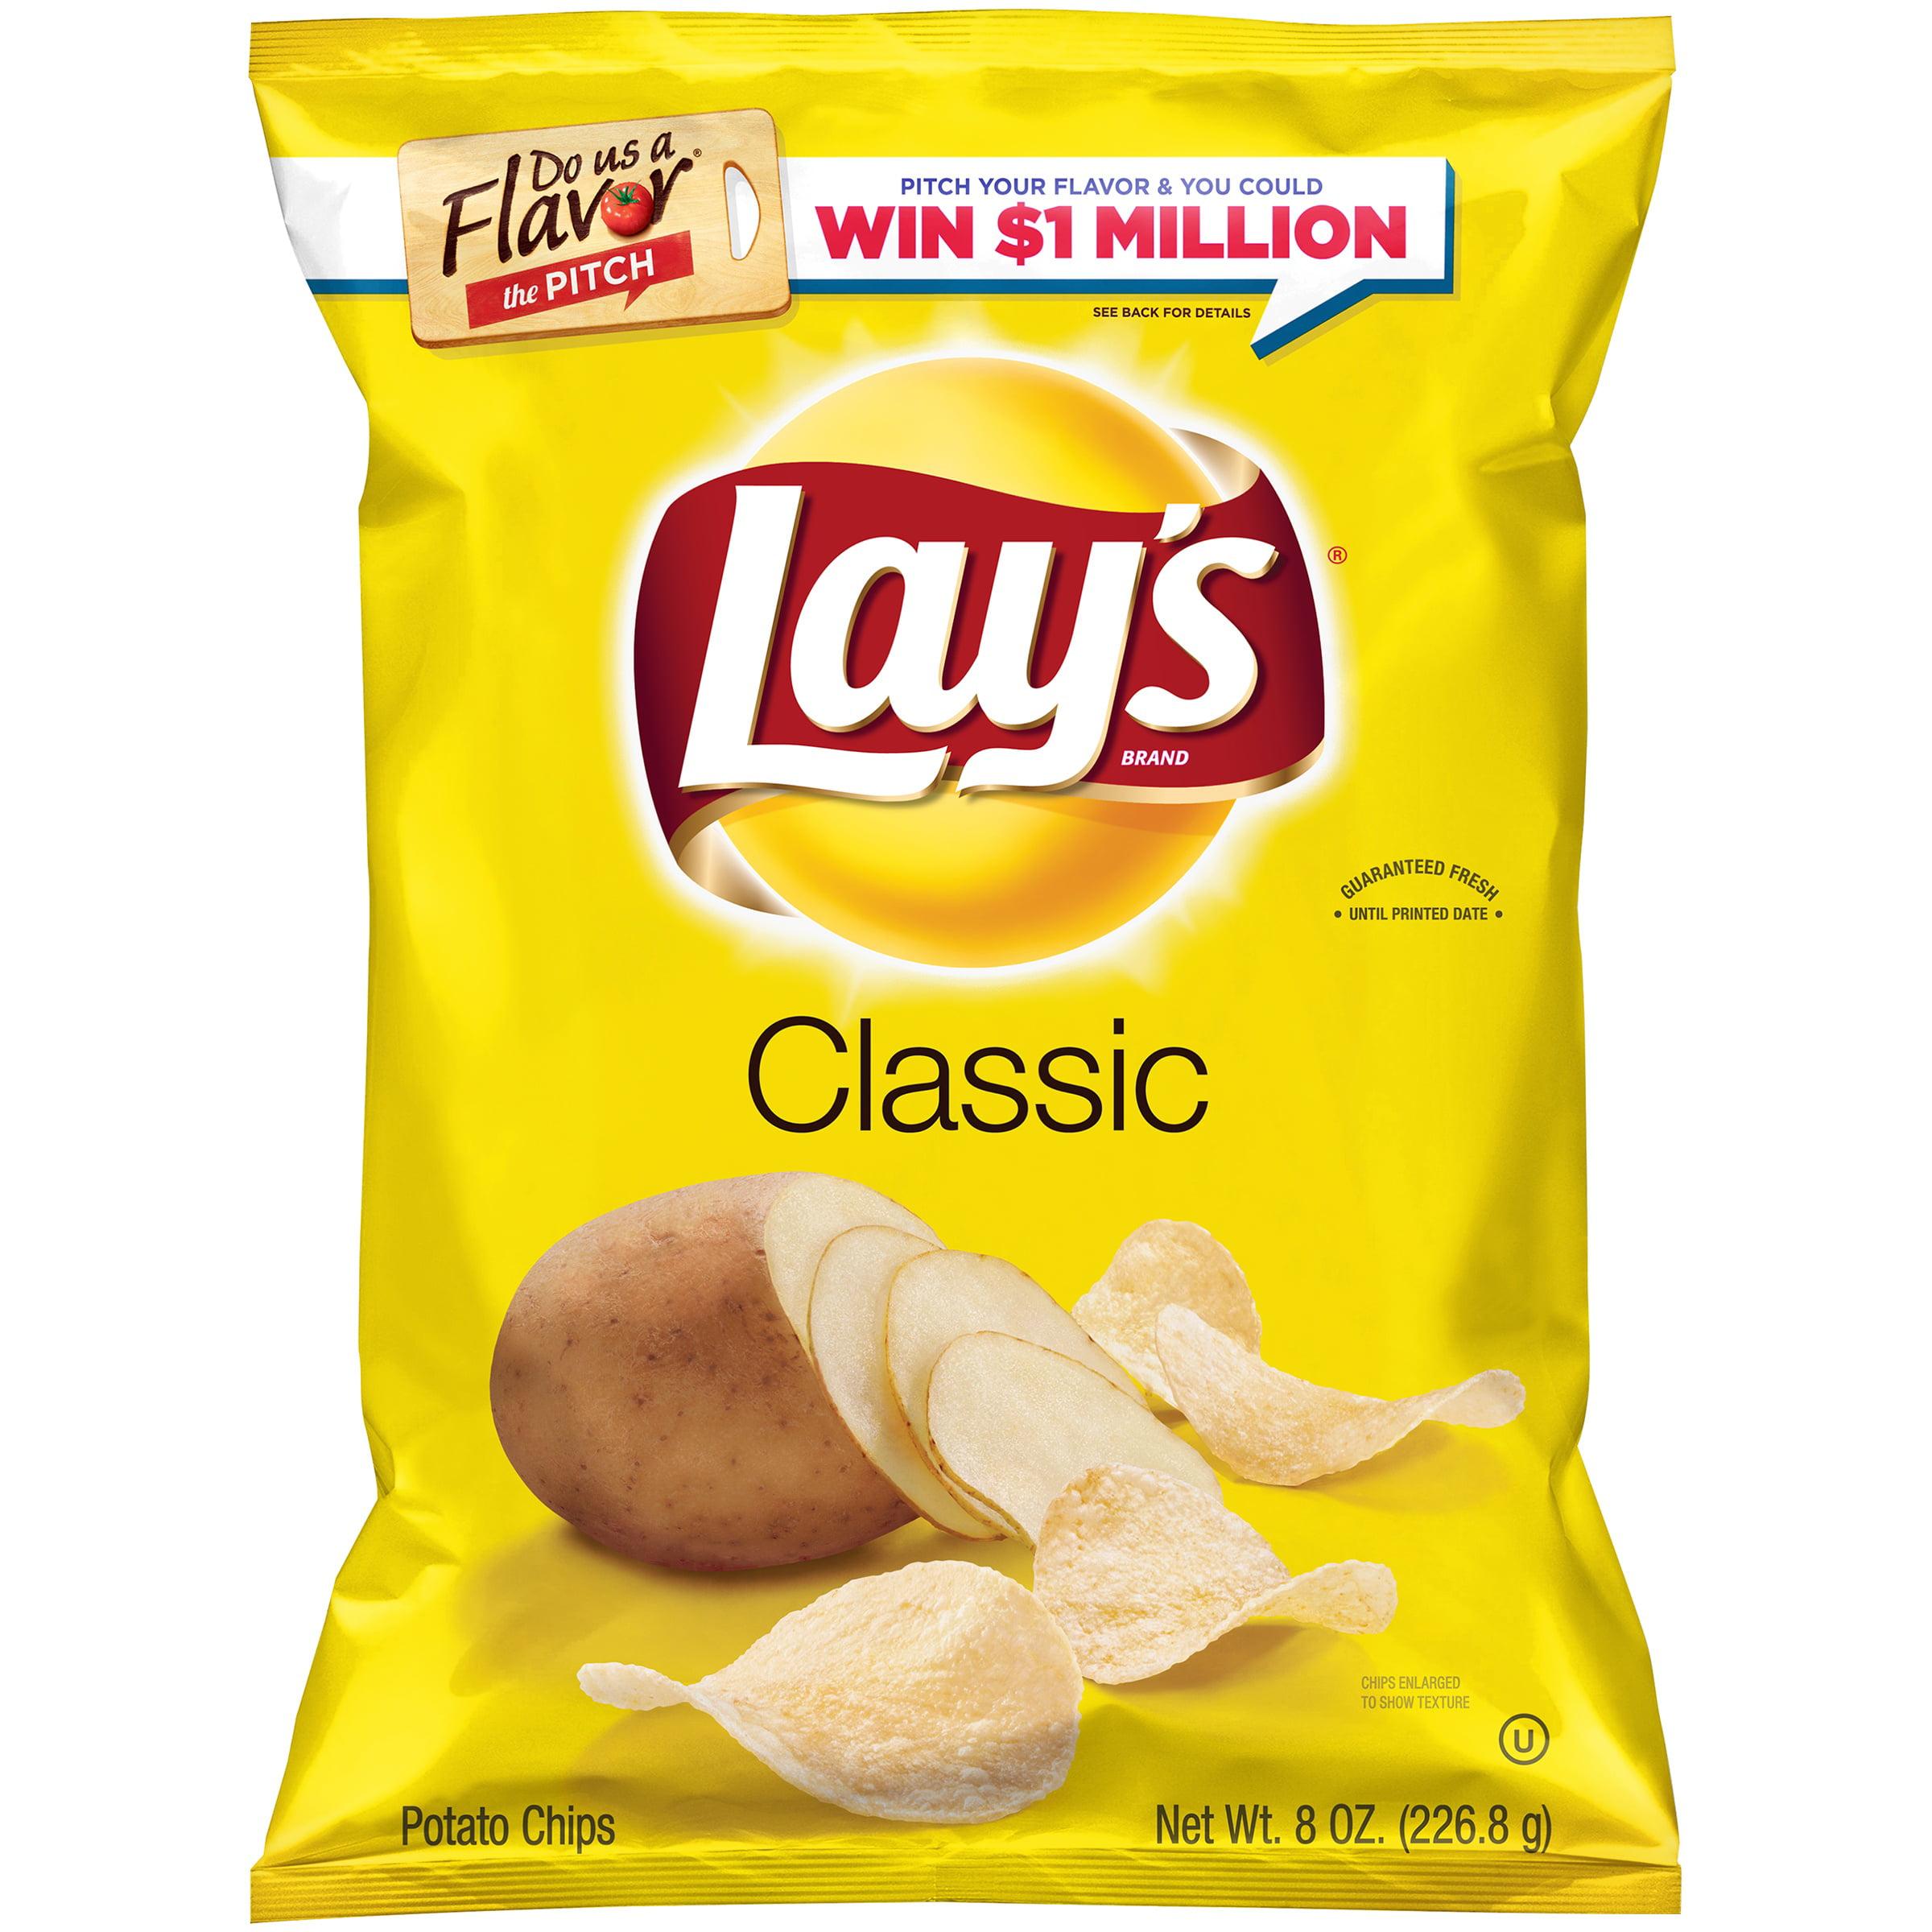 Lay's Classic Potato Chips, 8 oz. Bag by Frito-Lay, Inc.